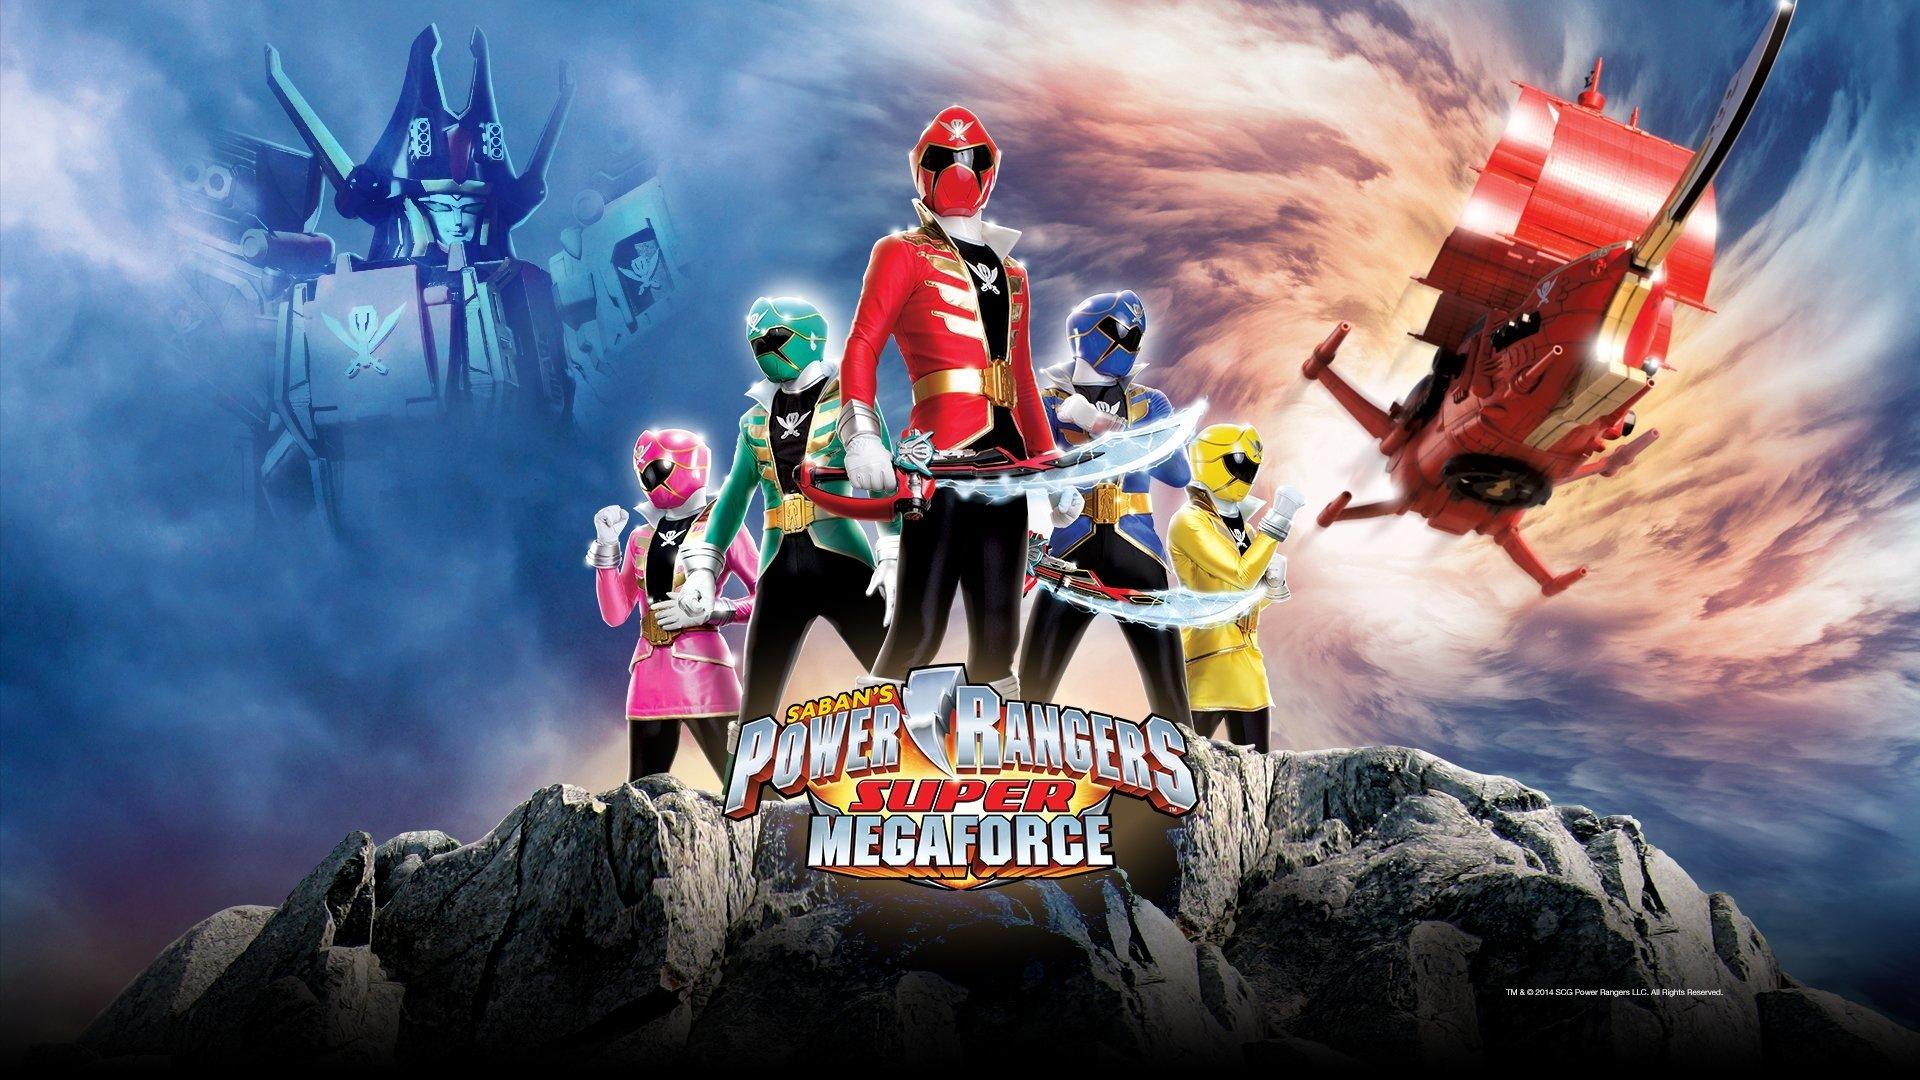 3 Power Rangers Super Megaforce HD Wallpapers